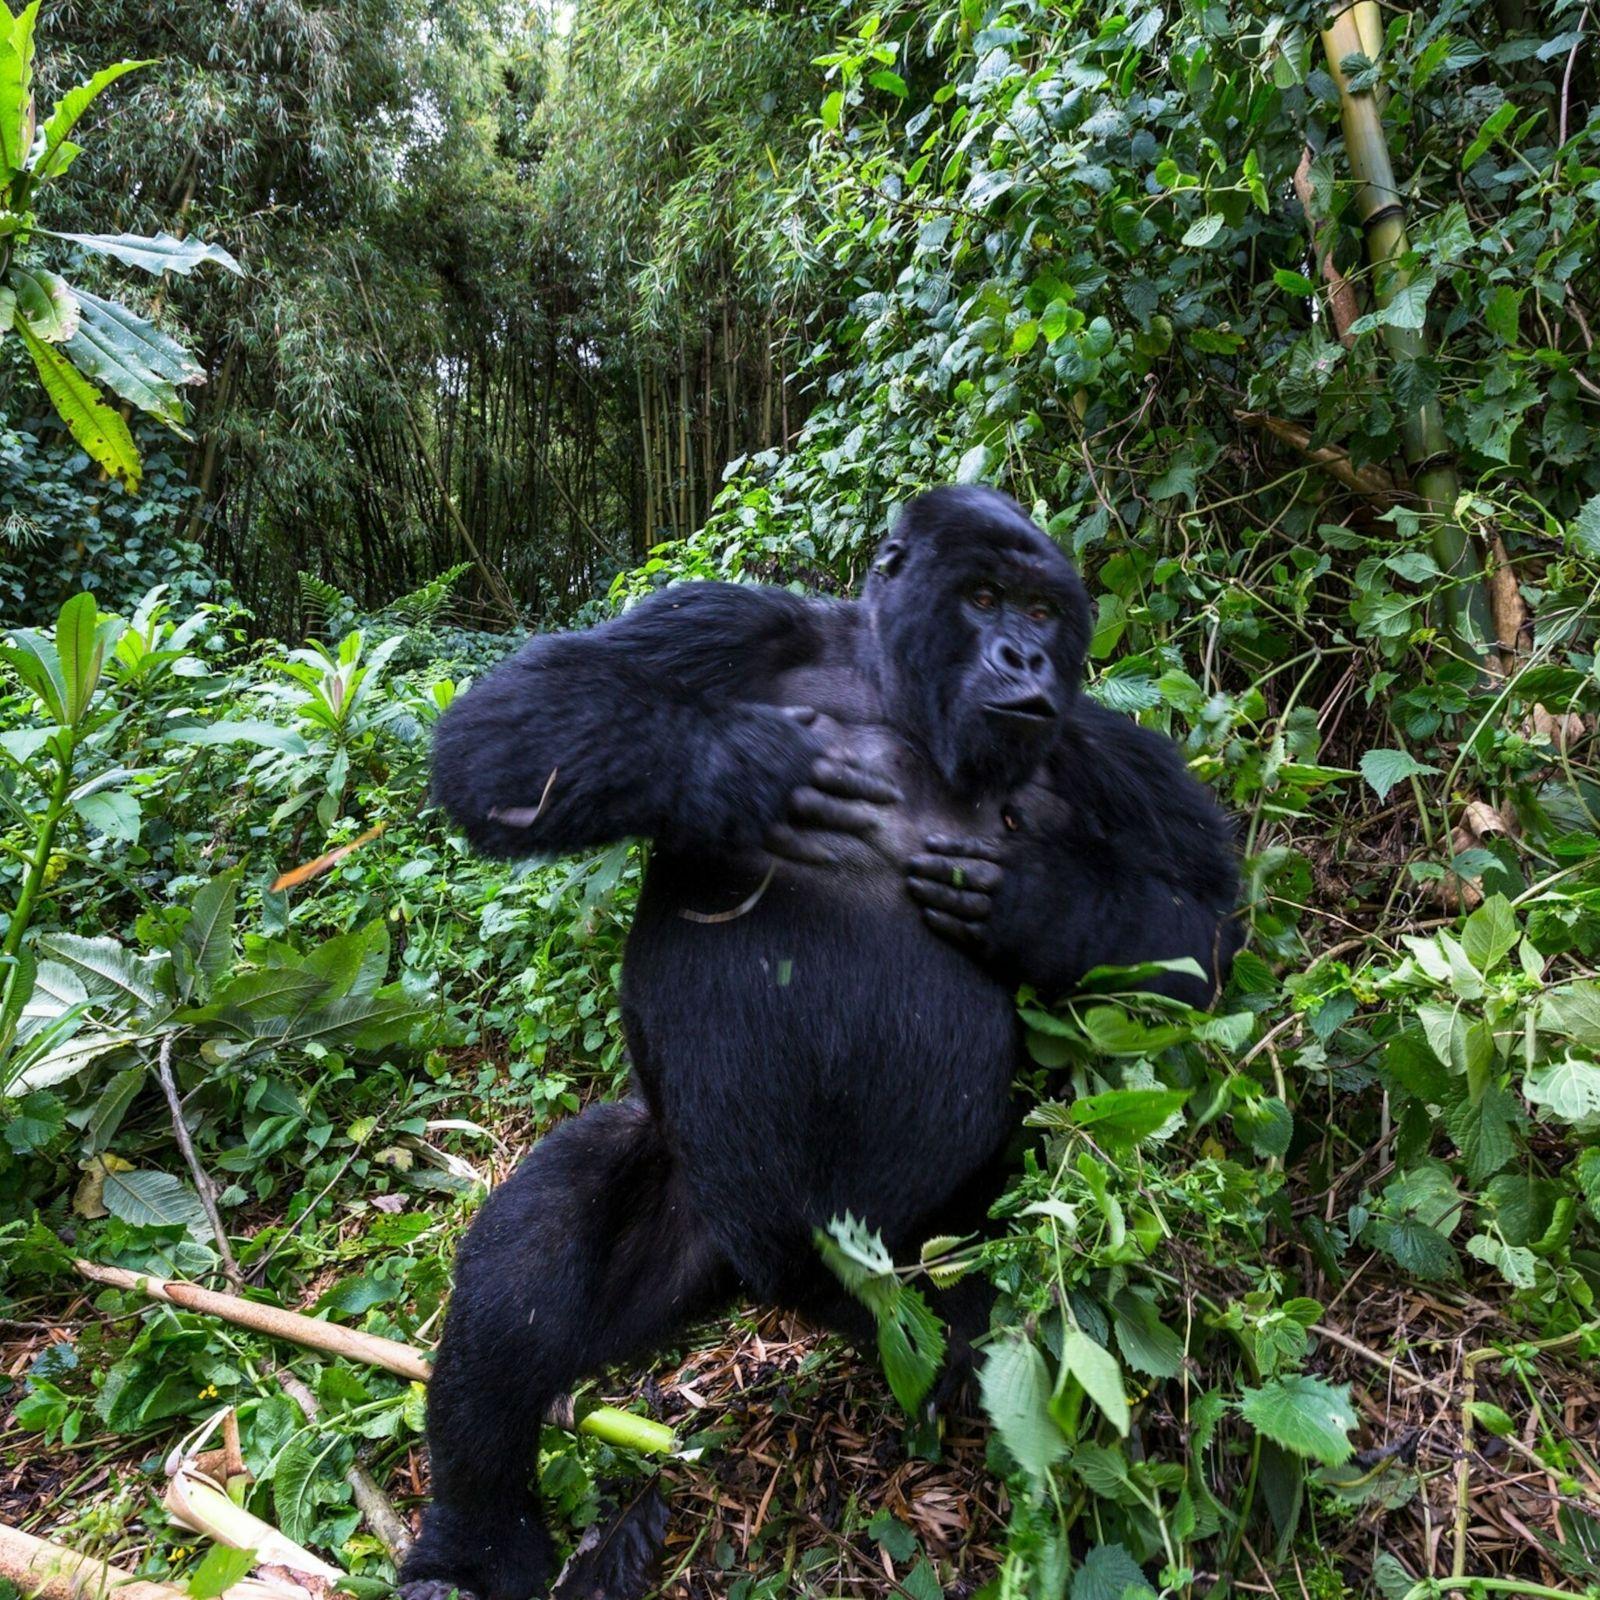 Mountain Gorilla Chest Beating